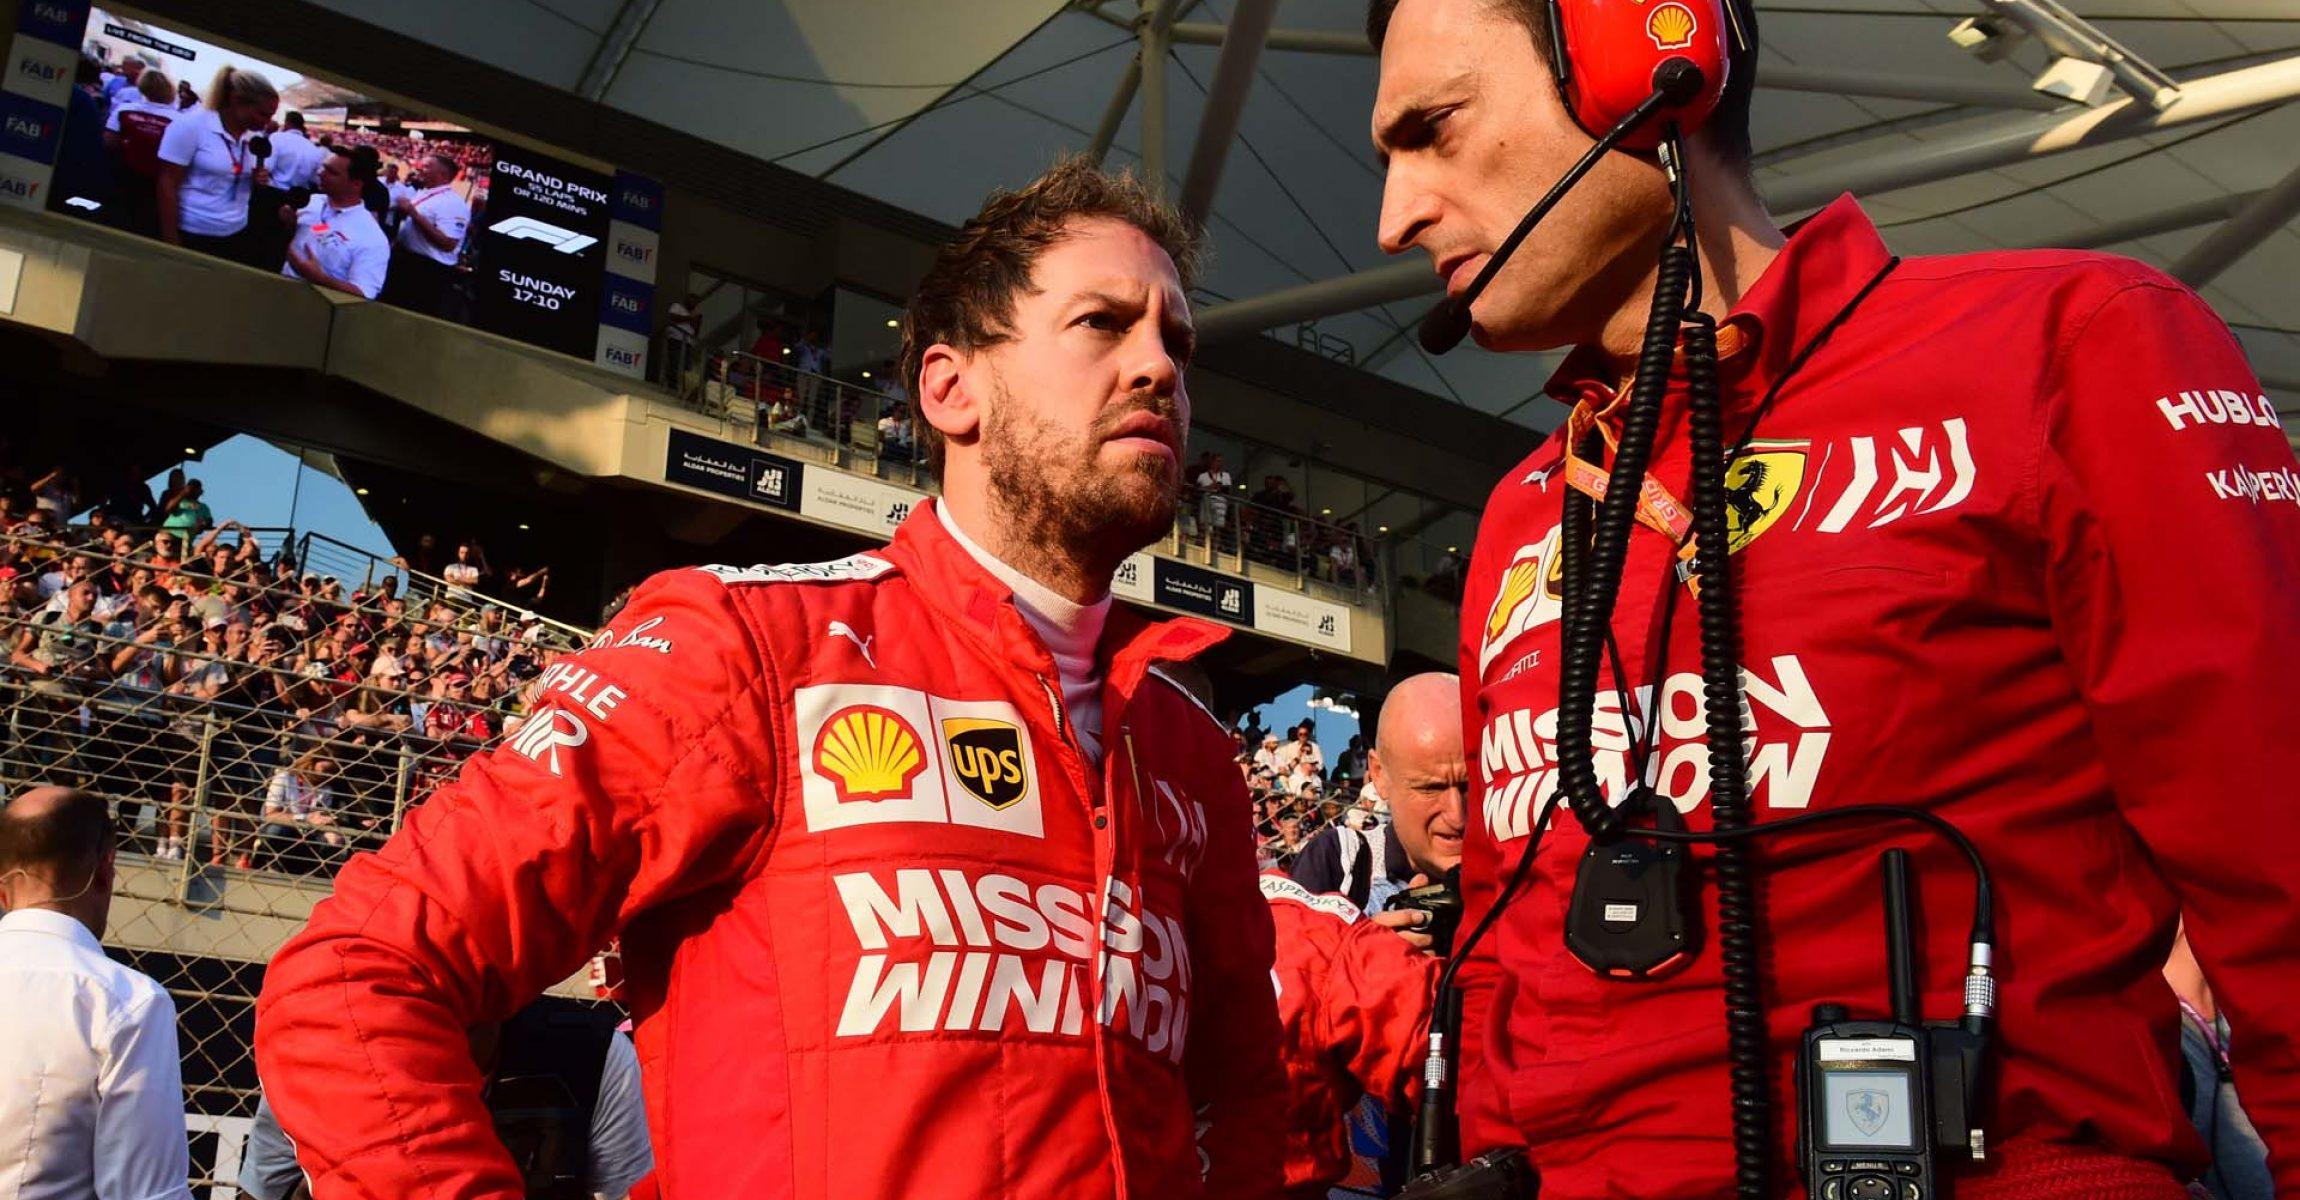 GP ABU DHABI  F1/2019 - DOMENICA 01/12/2019   credit: @Scuderia Ferrari Press Office Sebastian Vettel